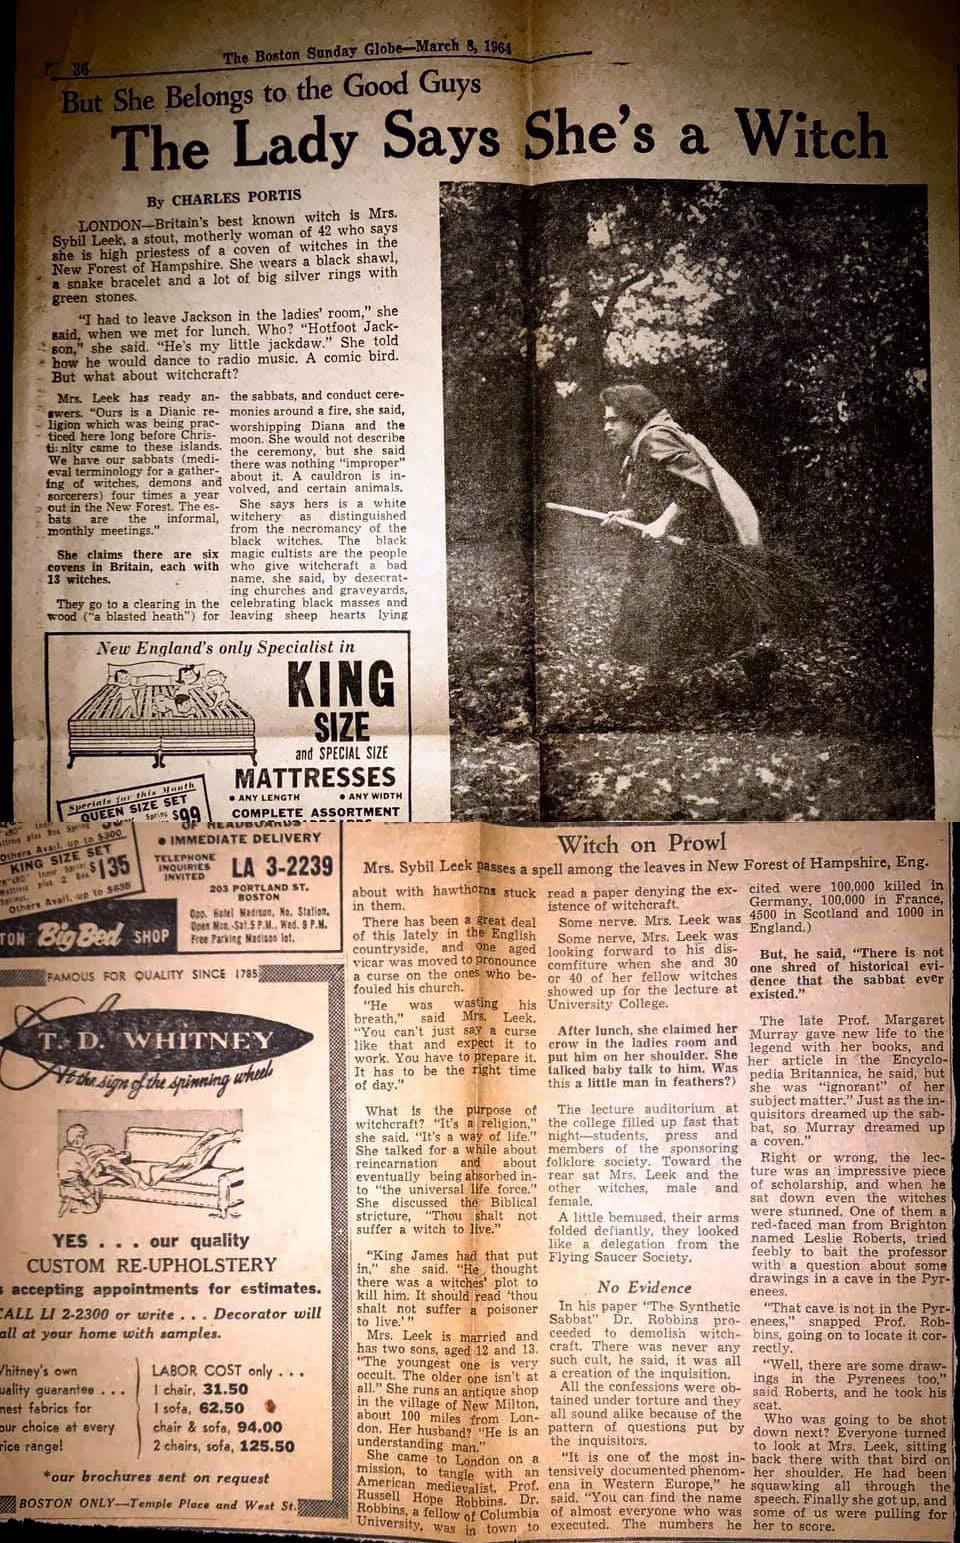 Sybil Leek Article - The Boston Sunday Globe - March 8, 1964